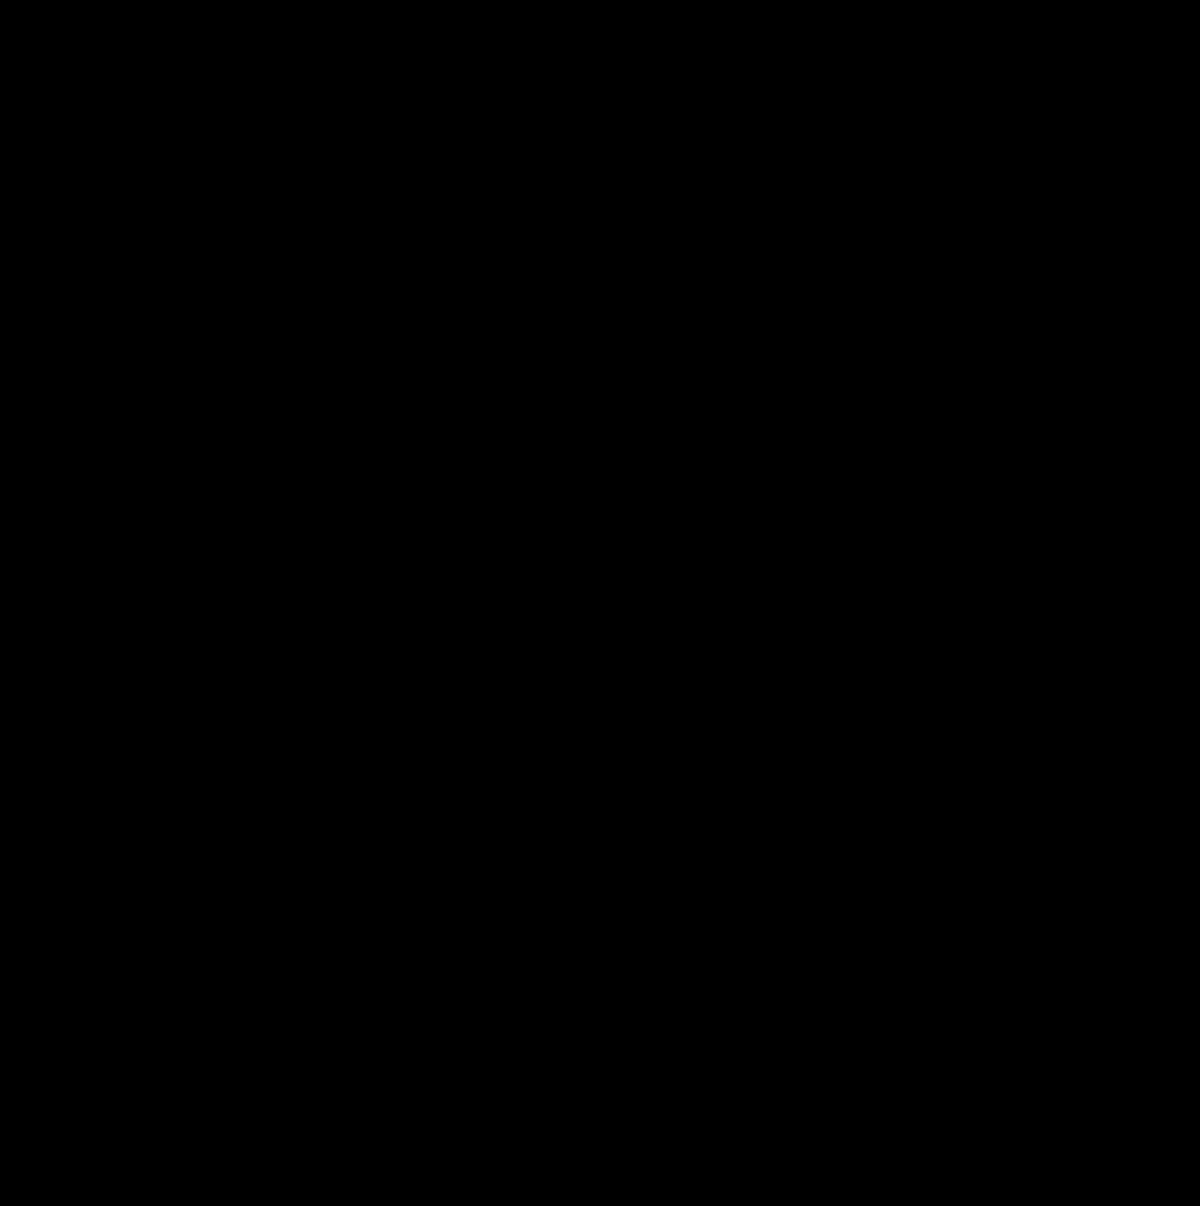 Black rose (symbolism).